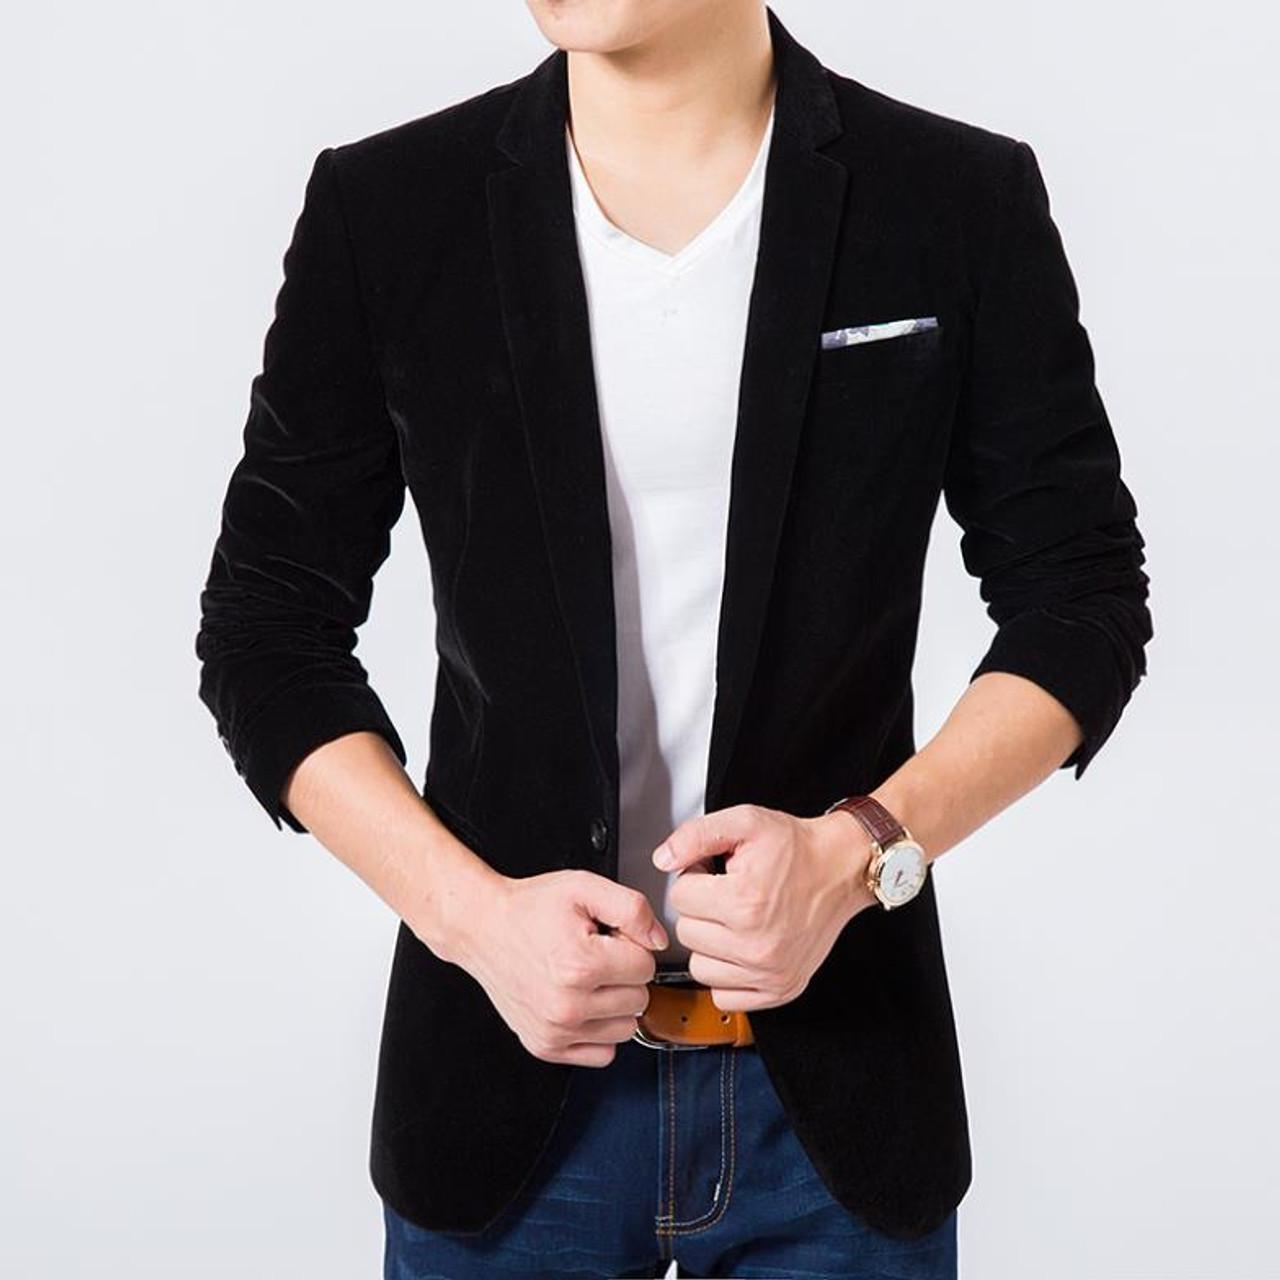 a79a7f03bd5e2 ... Mens blazer high quality suit jacket korean fashion velvet blue blazer  Male casual jacket single breasted ...